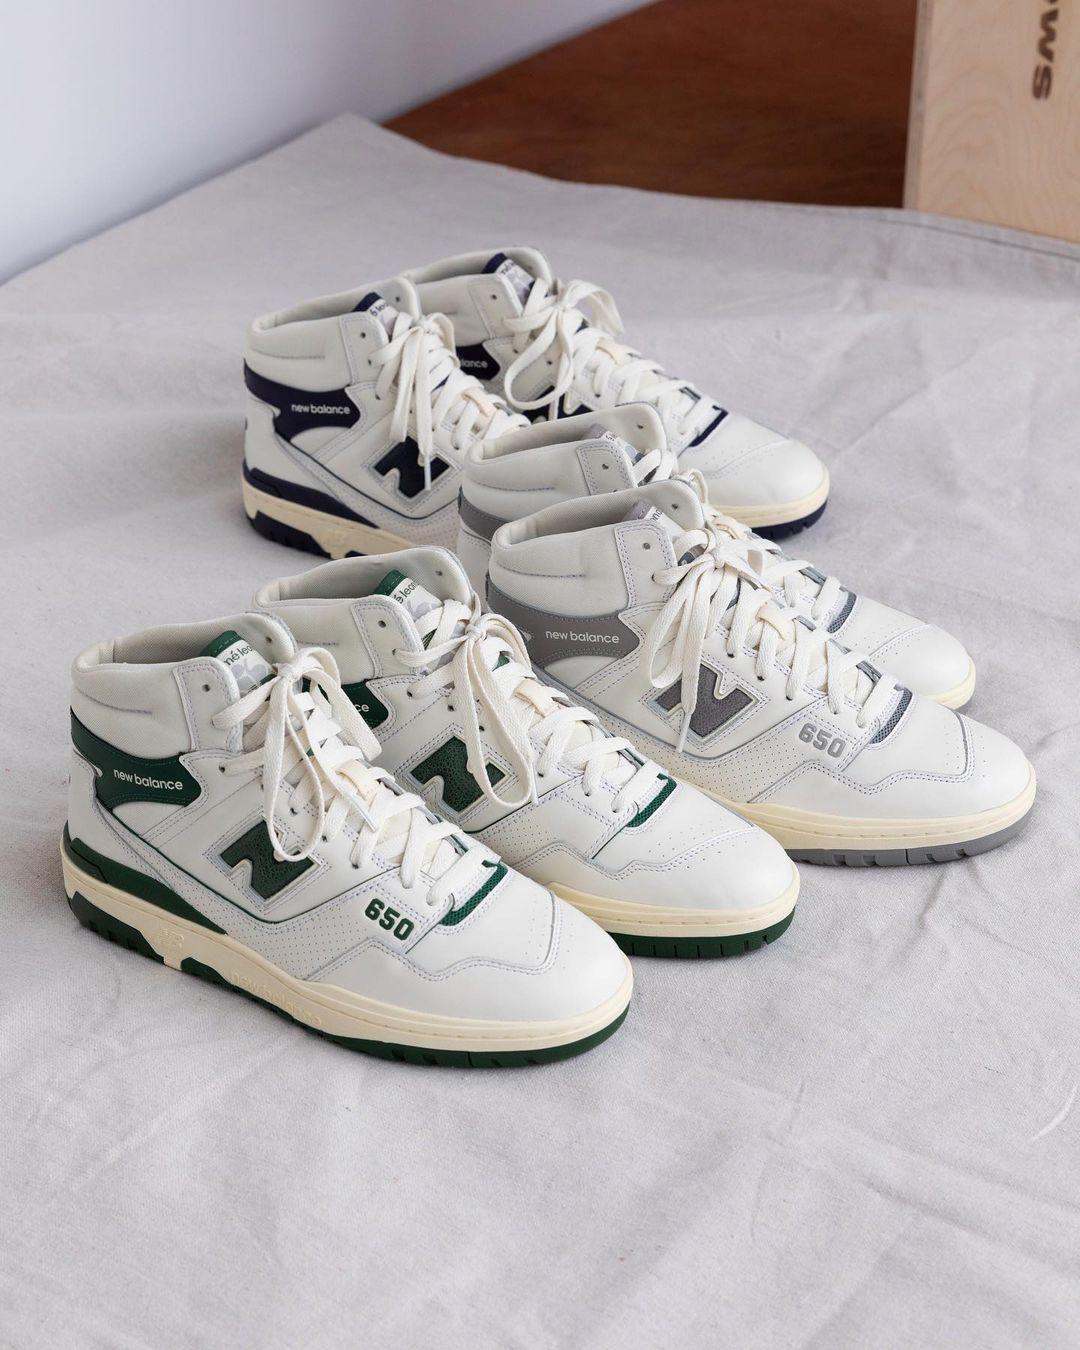 Aimé Leon Dore and New Balance Deliver More Nostalgia with Latest Sneaker